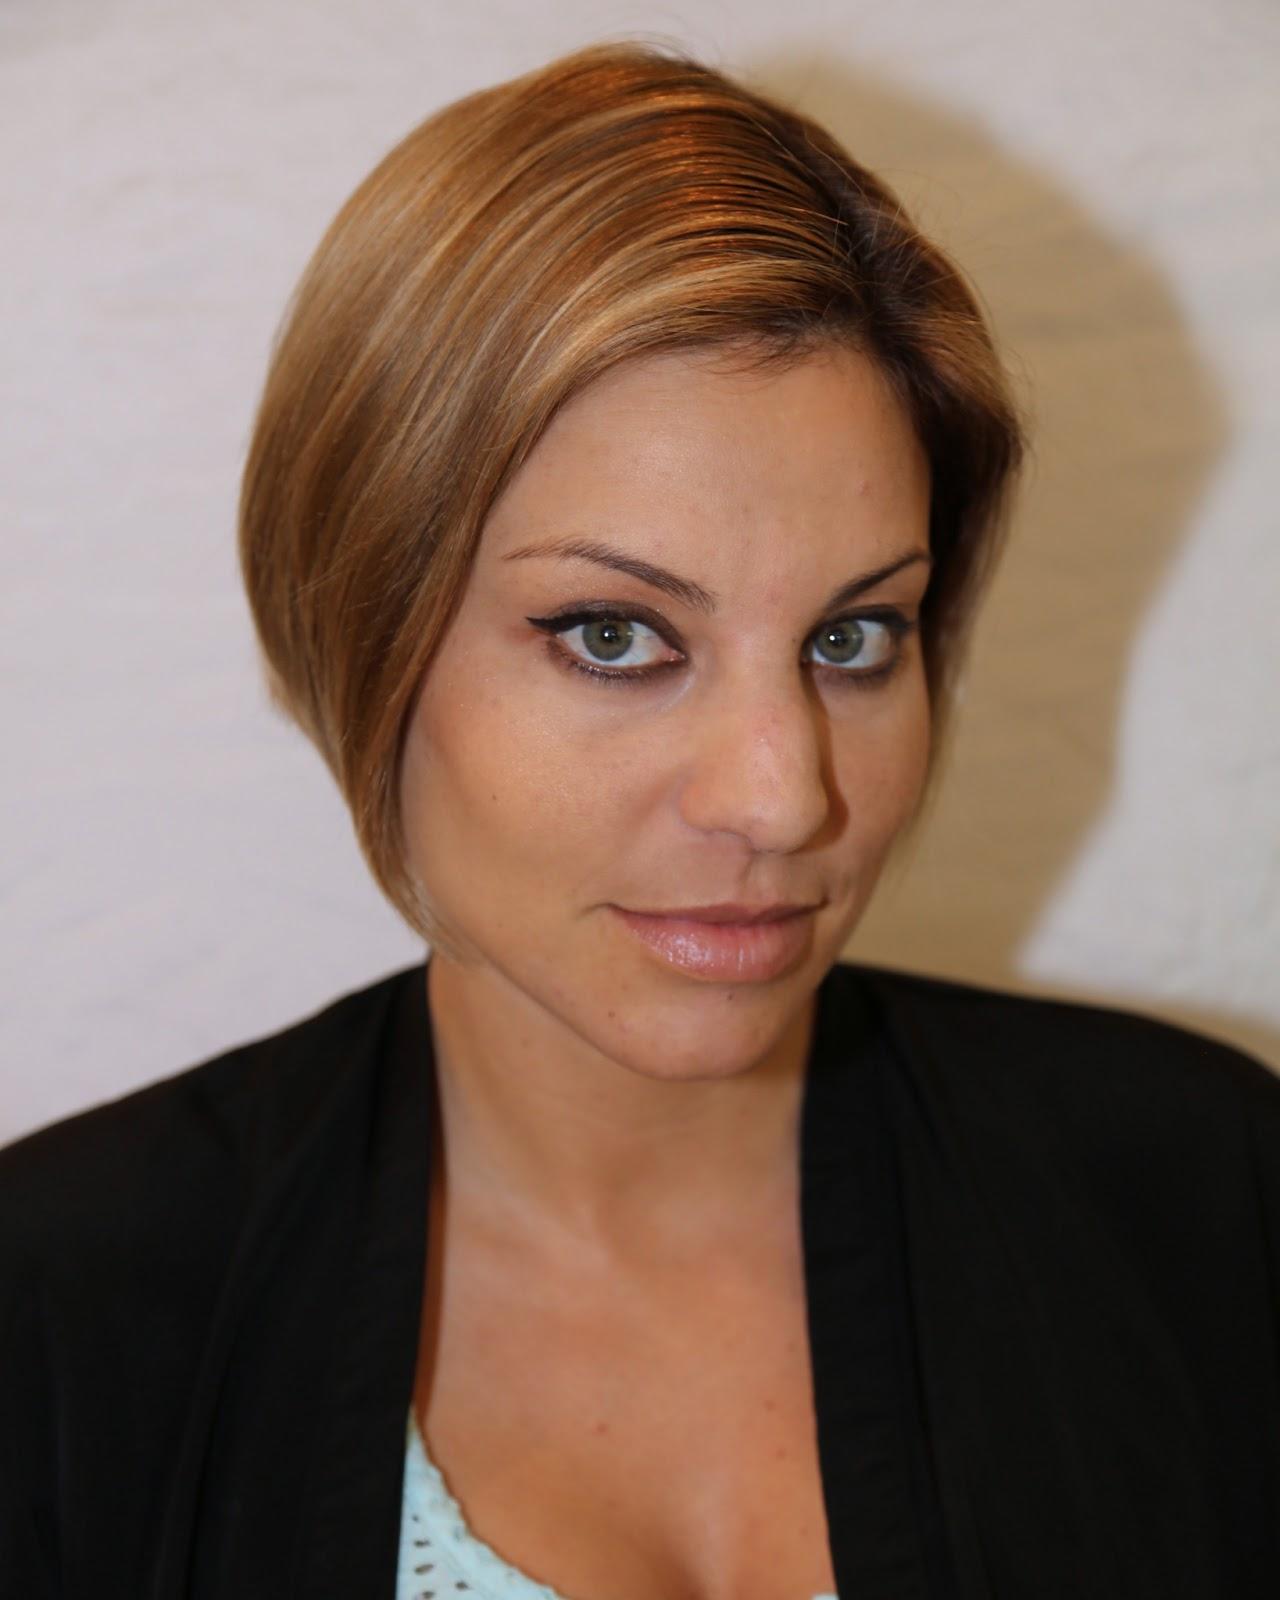 Jaymee Joaquin (b. 1979),Beenish Chohan Hot videos Laine MacNeil,Marianela Pereyra